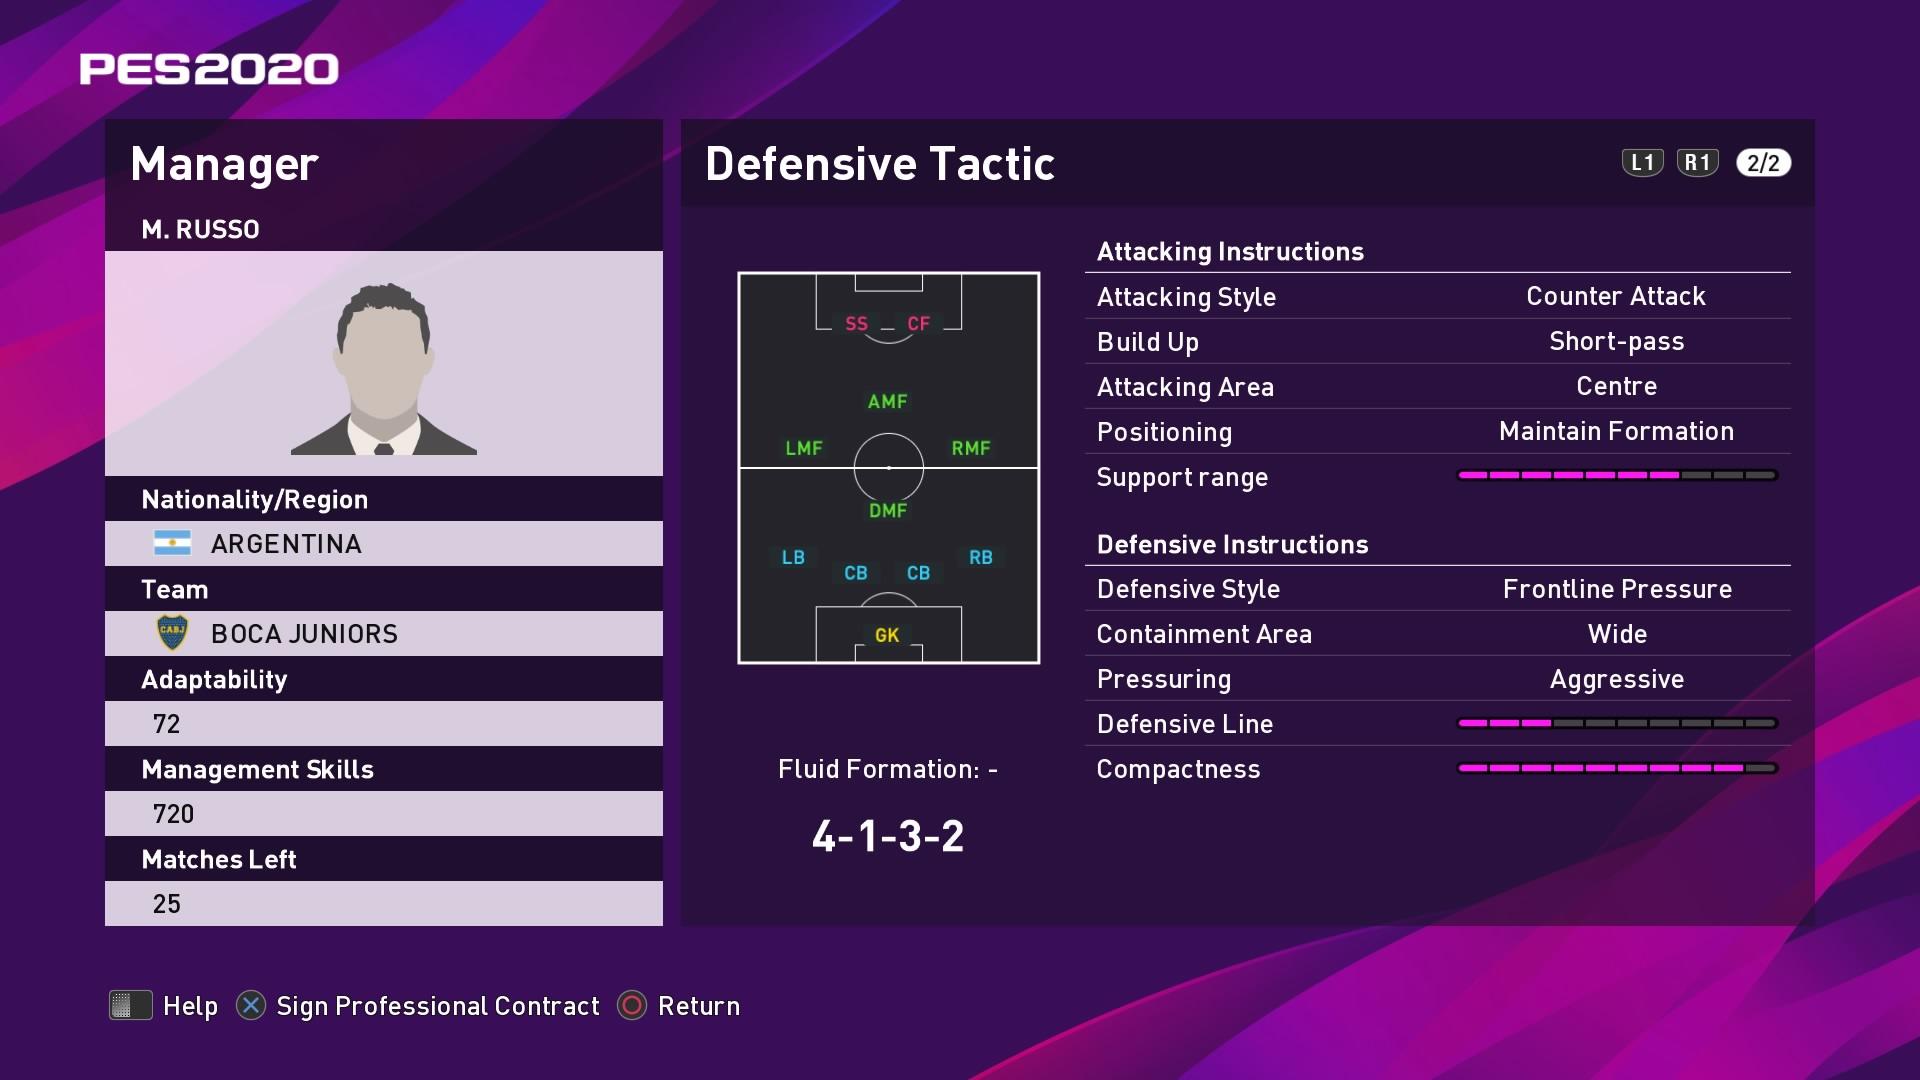 M. Russo (Miguel Ángel Russo) Defensive Tactic in PES 2020 myClub